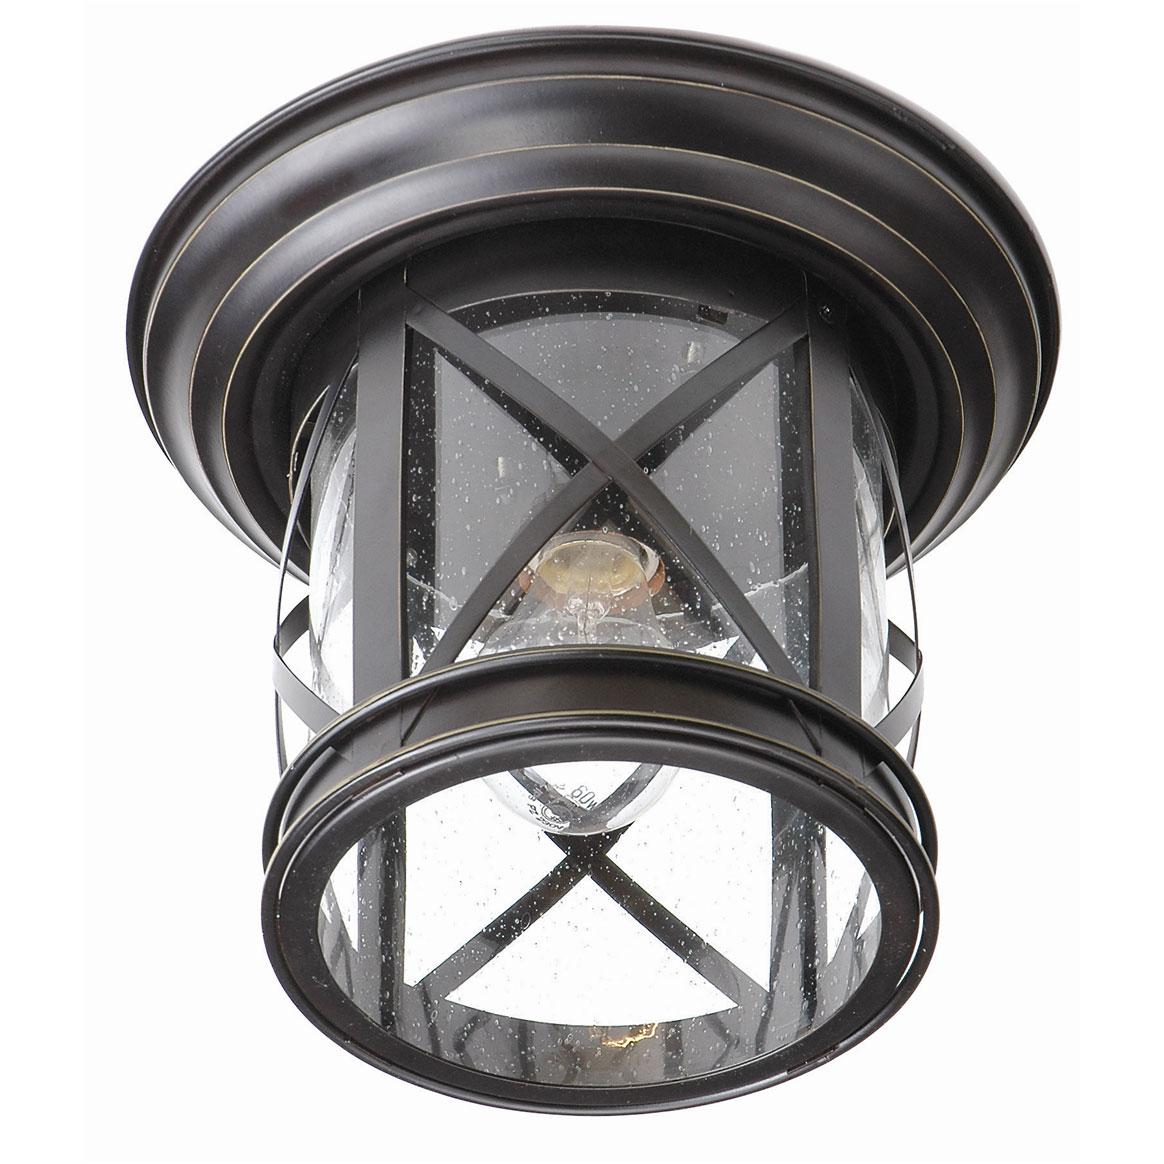 Outdoor Flush Mount Ceiling Light Fixtures Alexsullivanfund